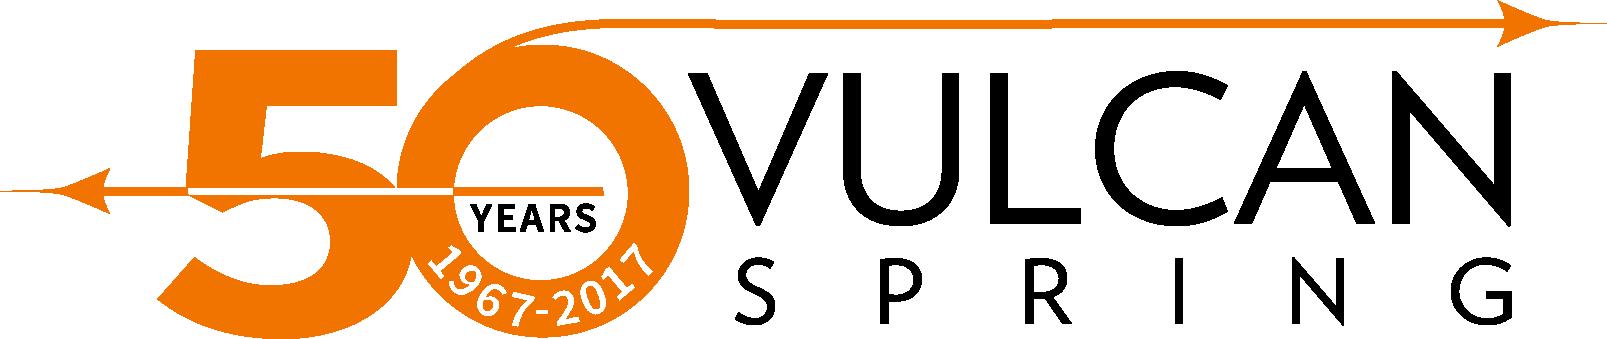 vulcan-logo_50th_all-orange-black_window.png